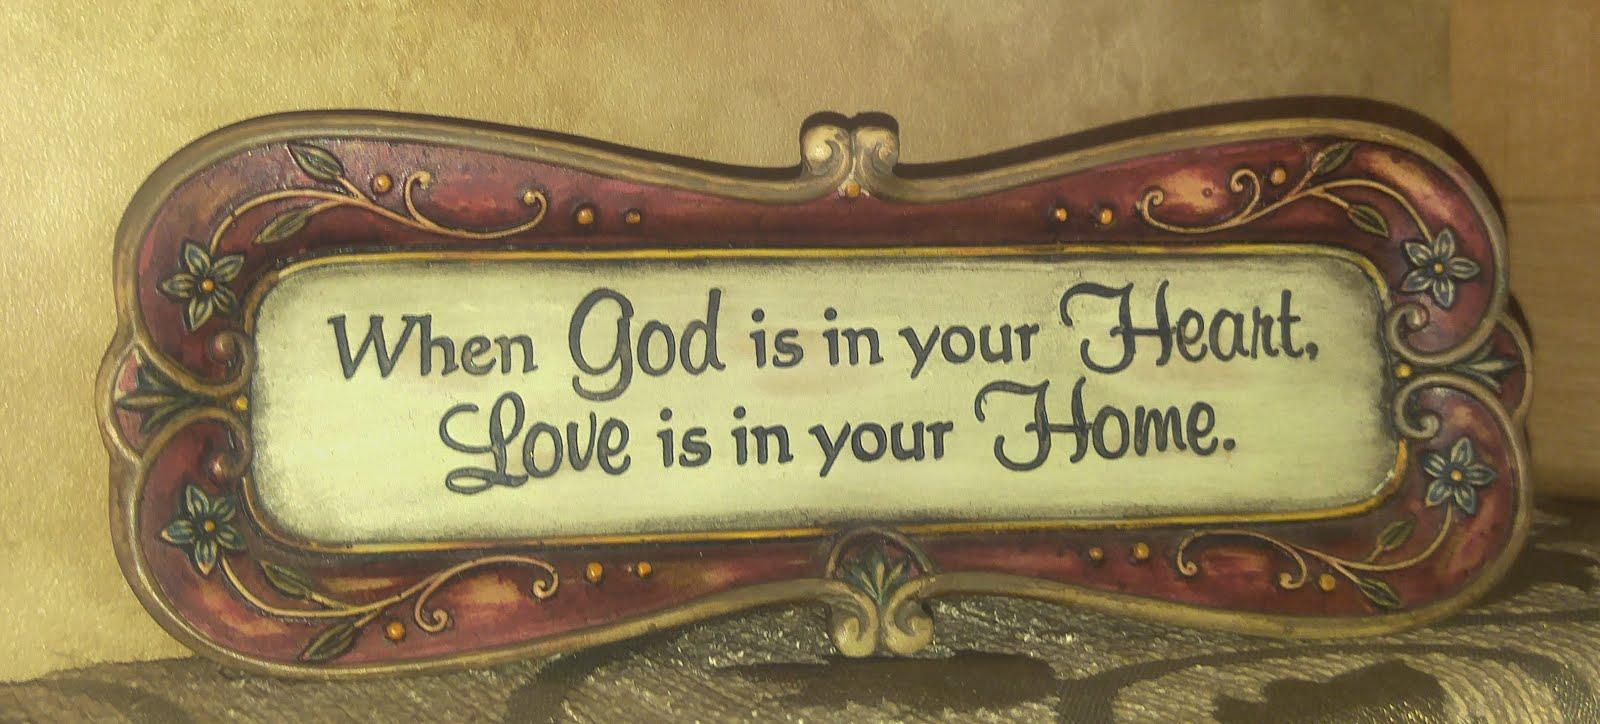 Heart Love Home